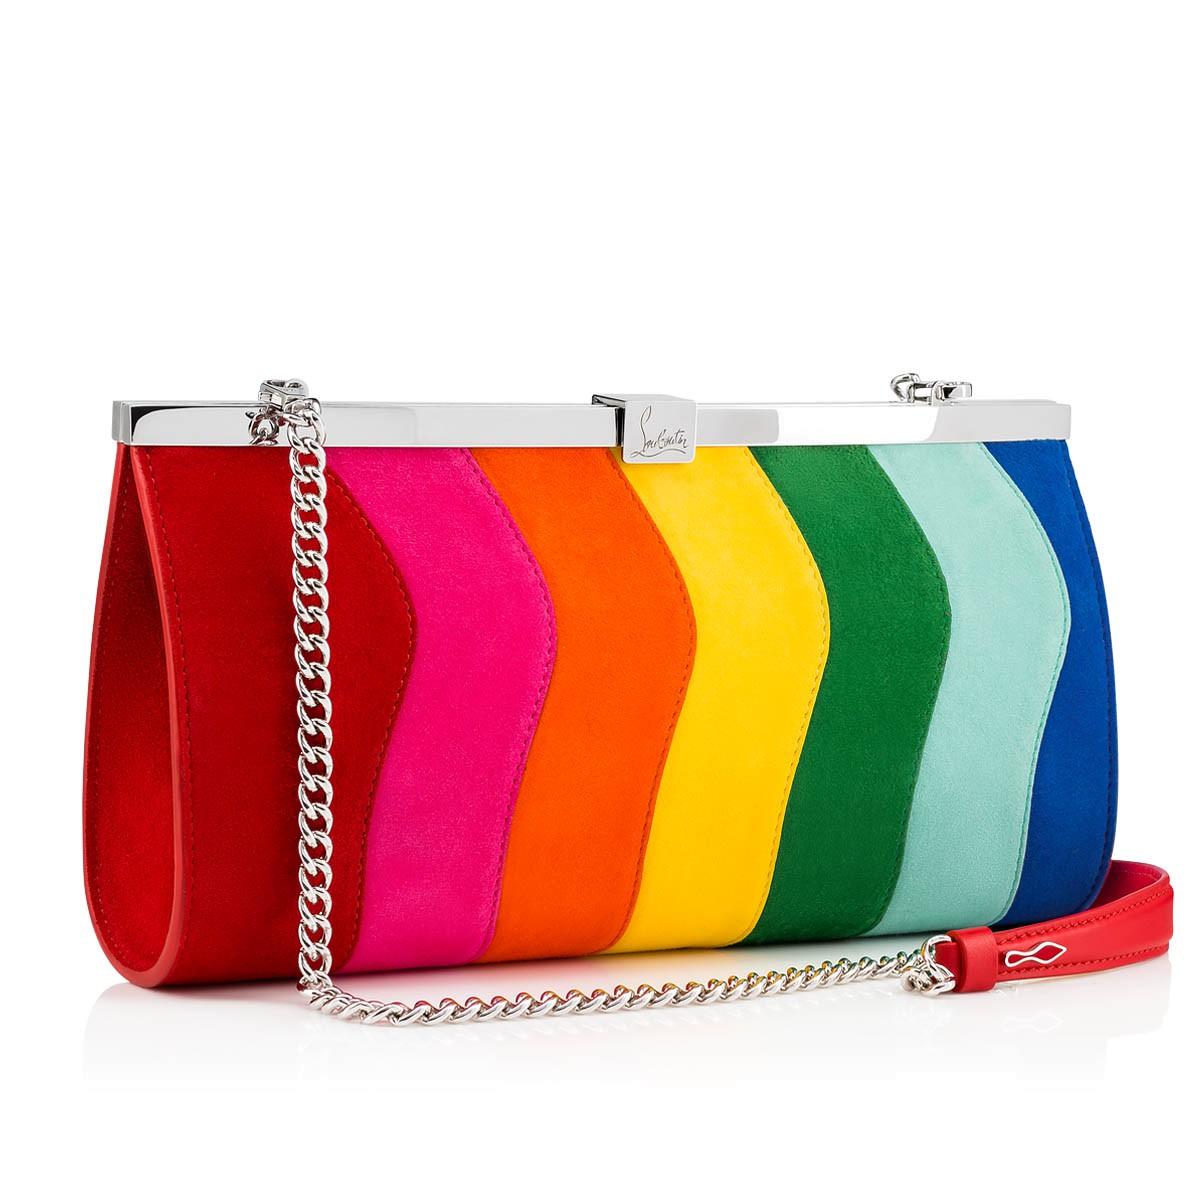 Women Bags - Palmette Clutch - Christian Louboutin